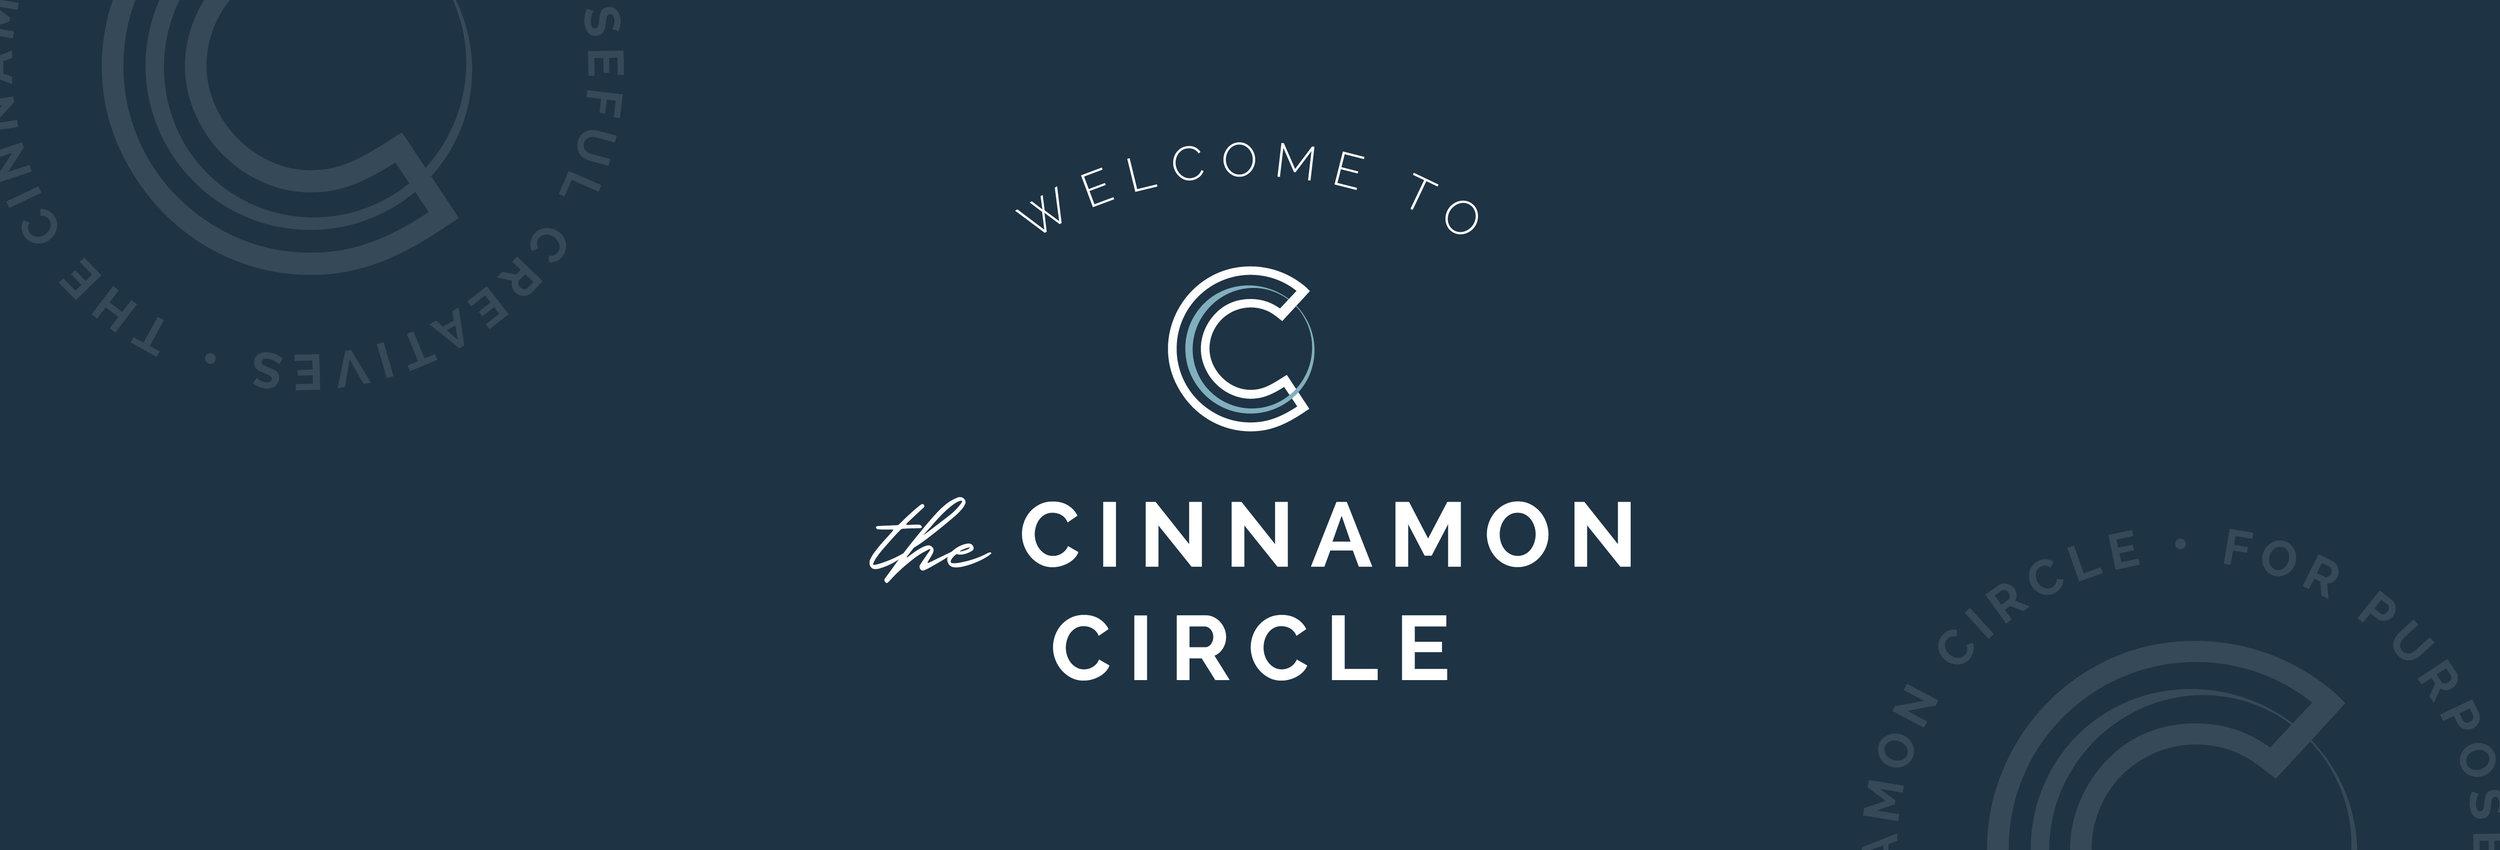 The Cinnamon Circle